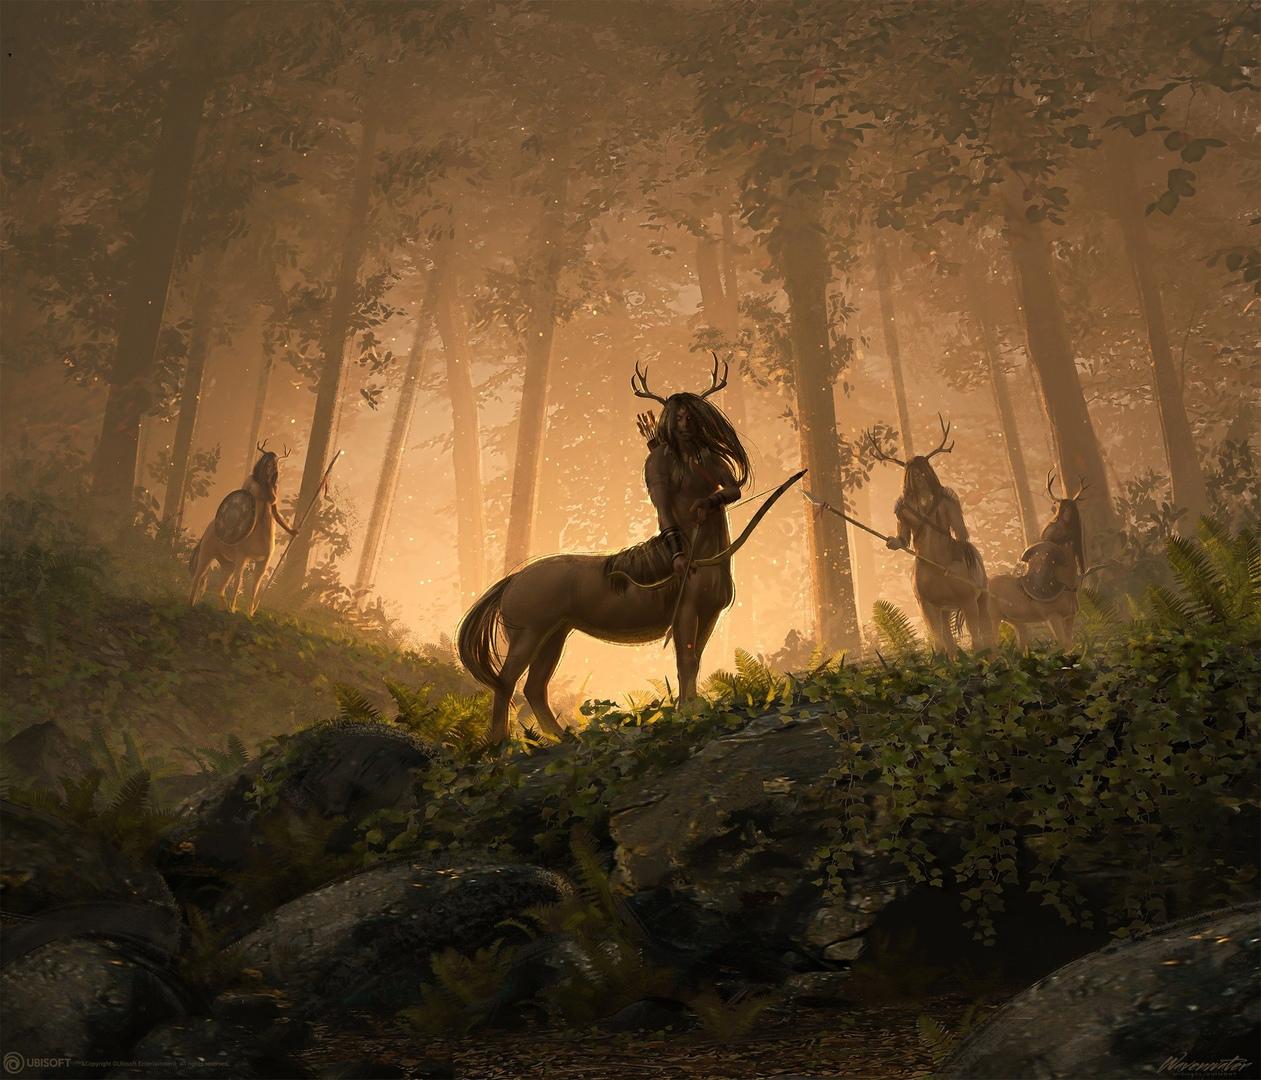 u8dGpG8neCo.jpg - Assassin's Creed: Odyssey